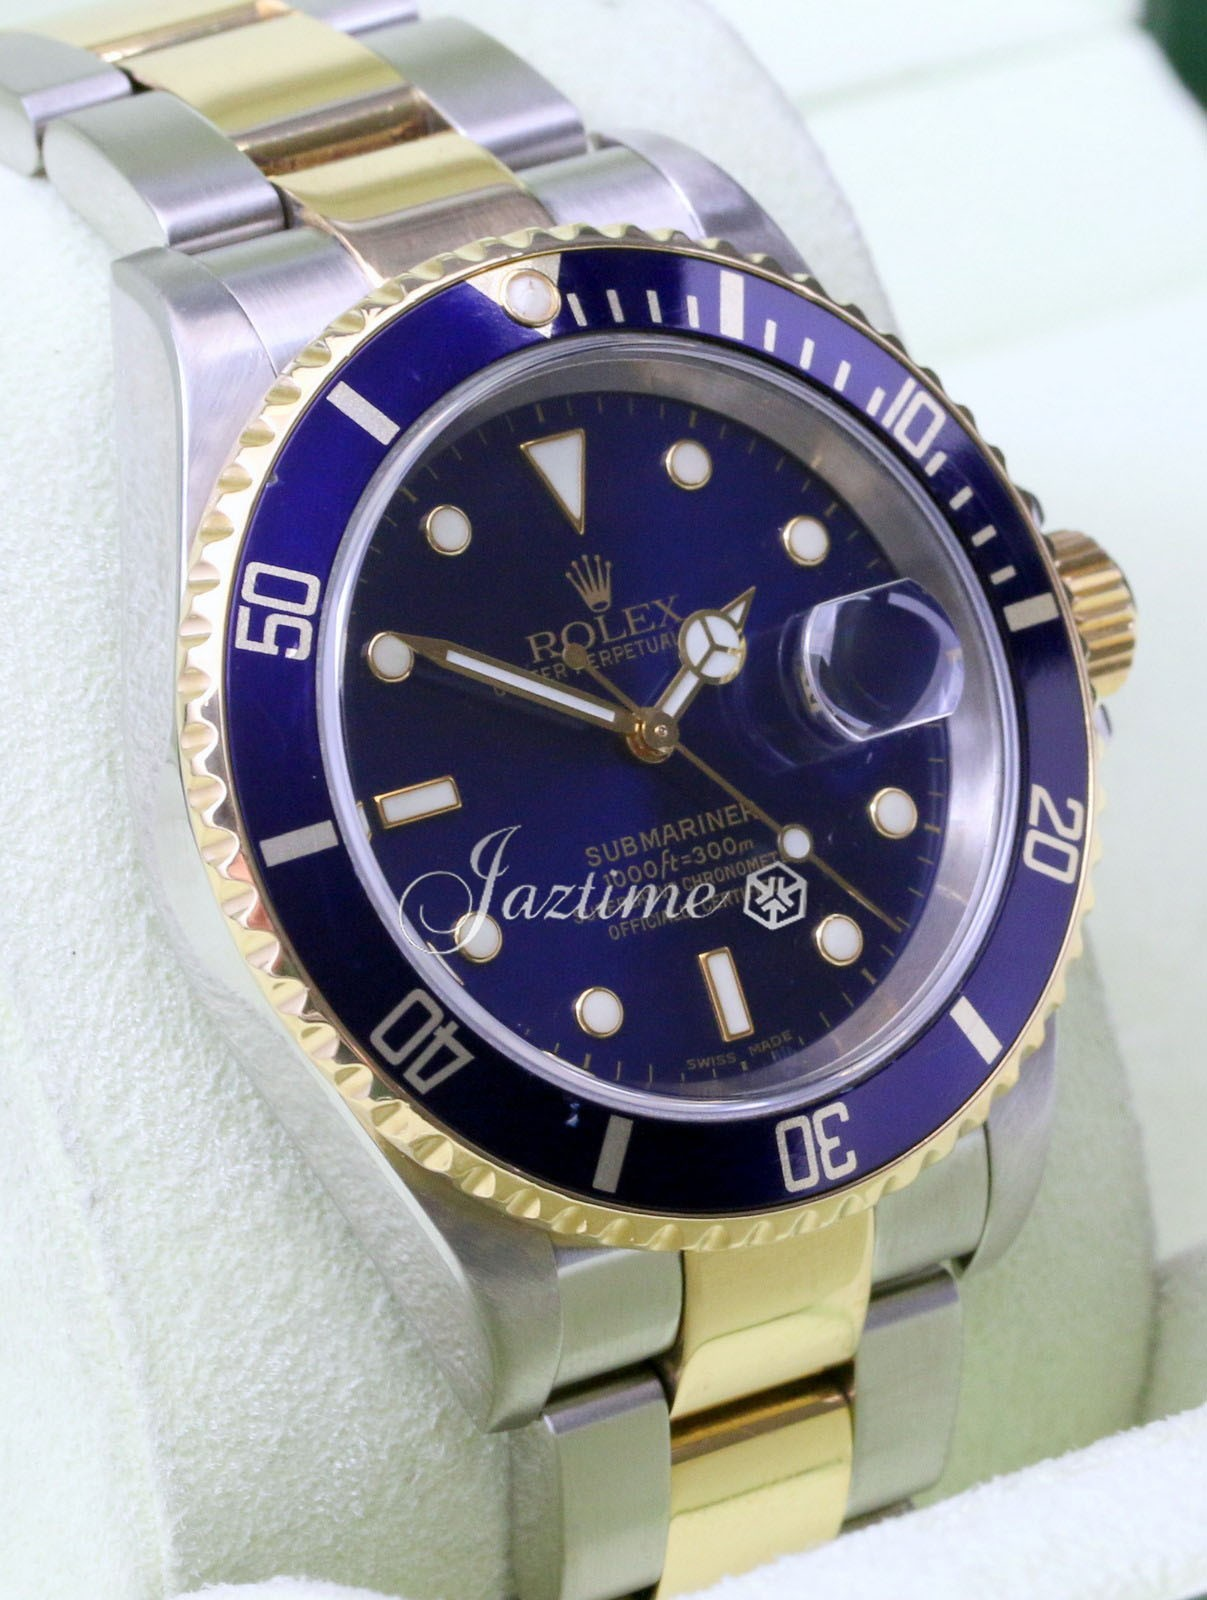 Rolex 16613 Submariner Blue » for SALE